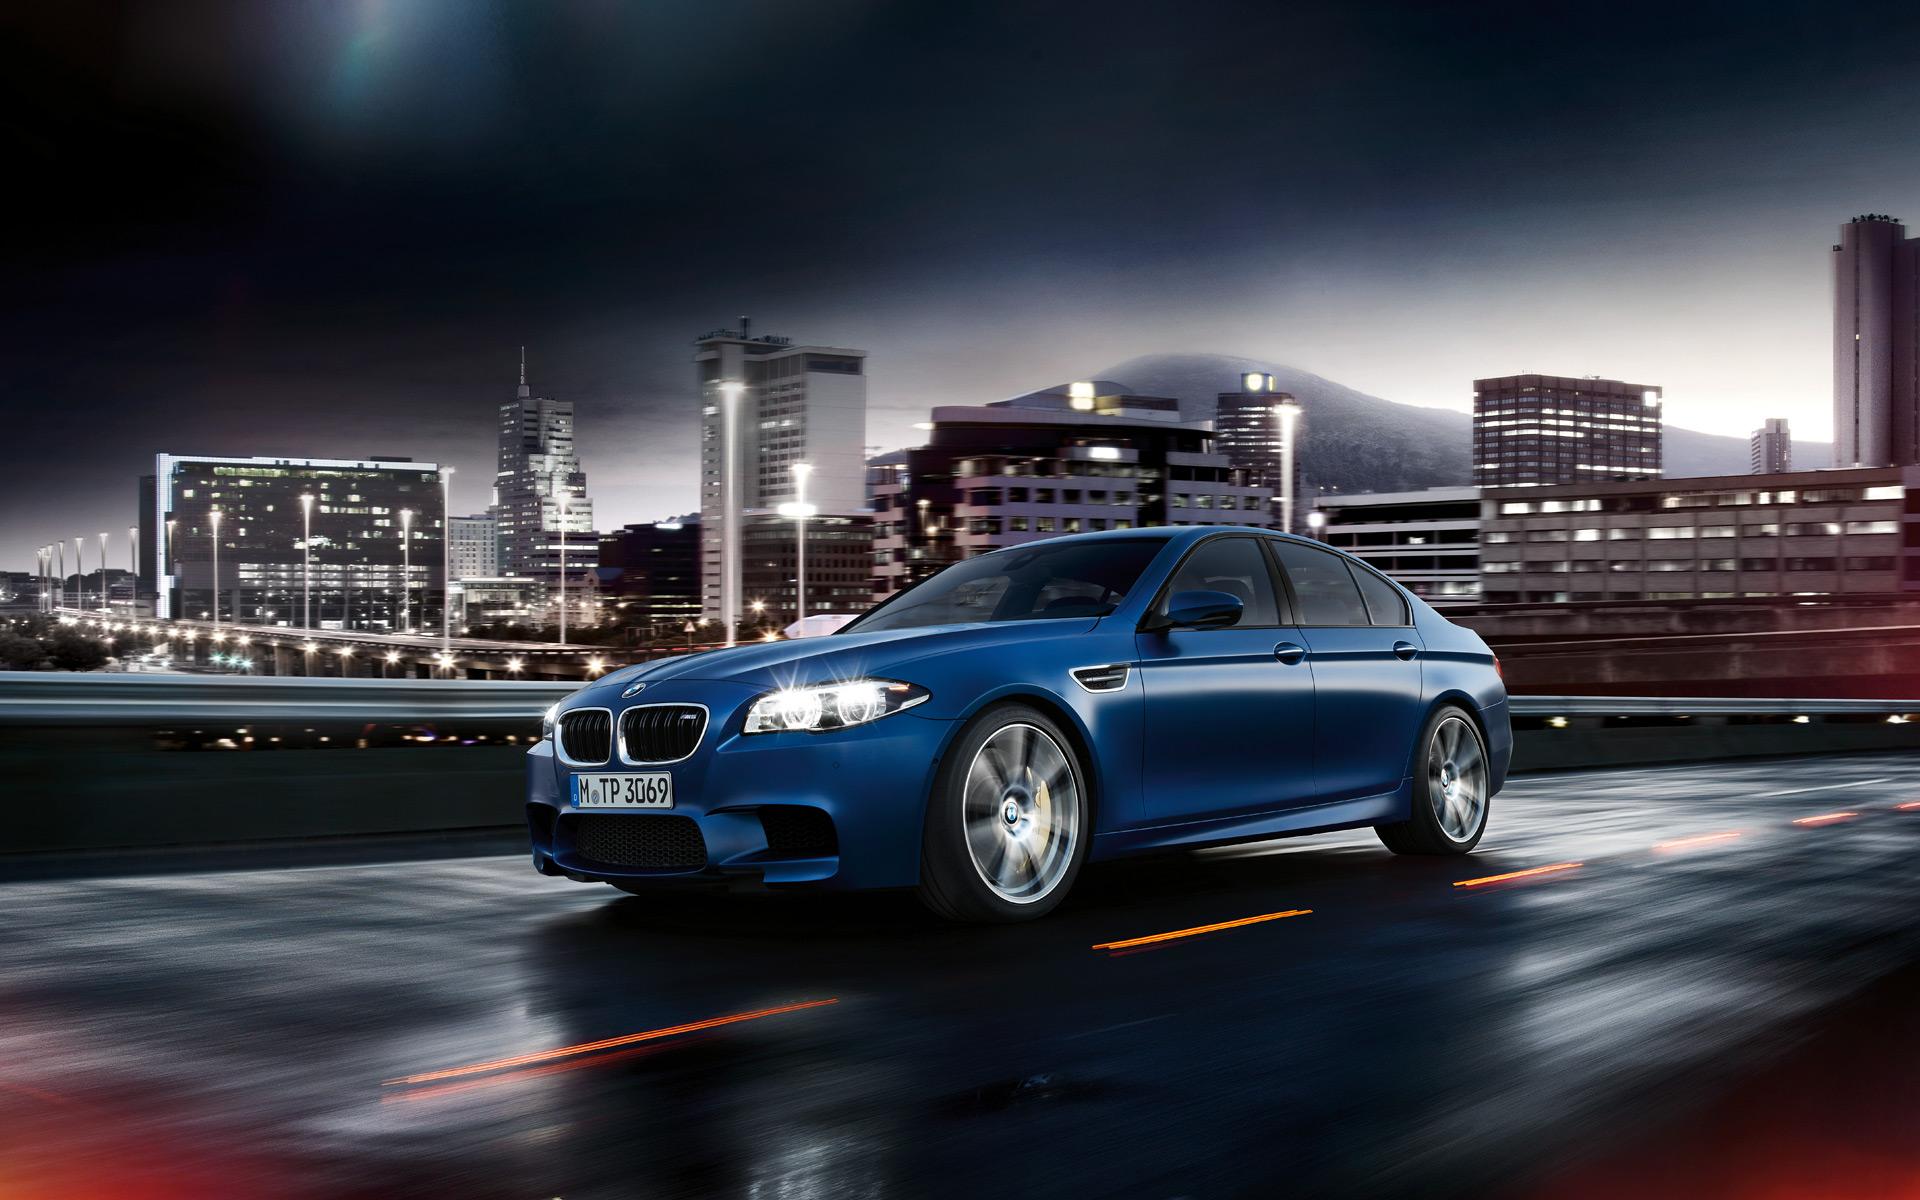 BMW M5 LCI Wallpapers